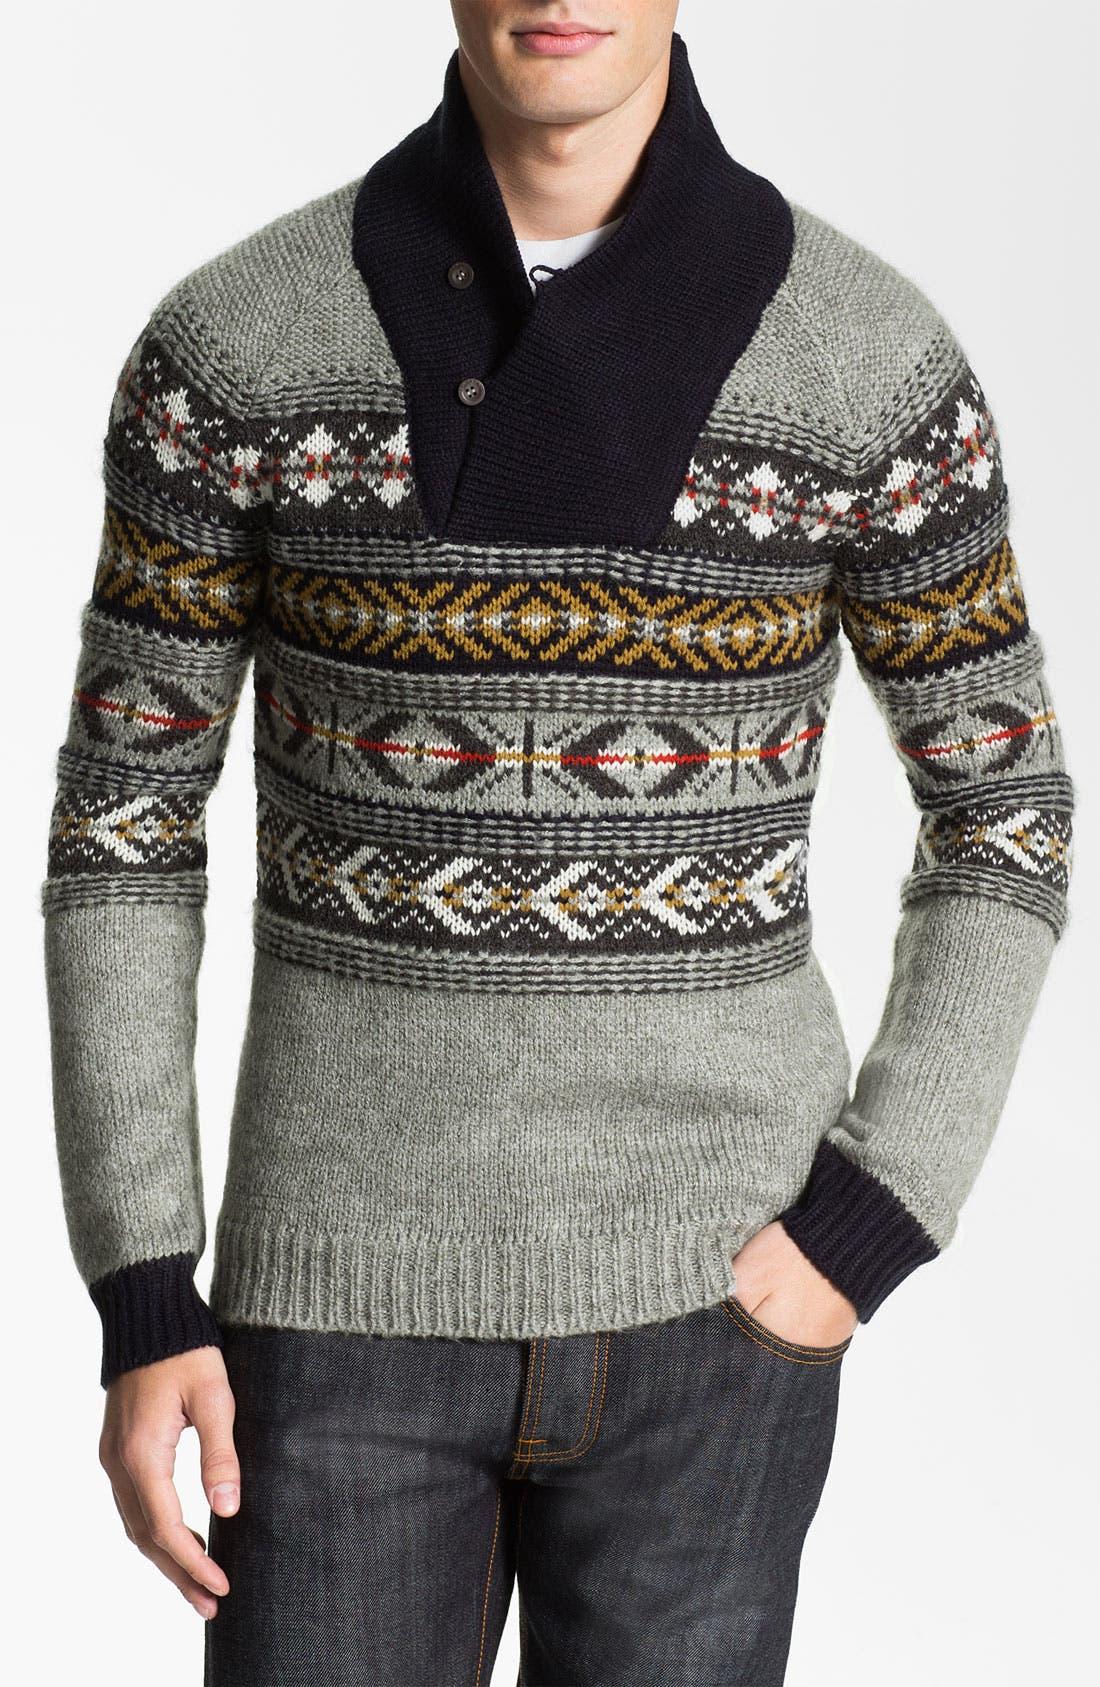 Alternate Image 1 Selected - J.C. Rags Jacquard Shawl Collar Sweater